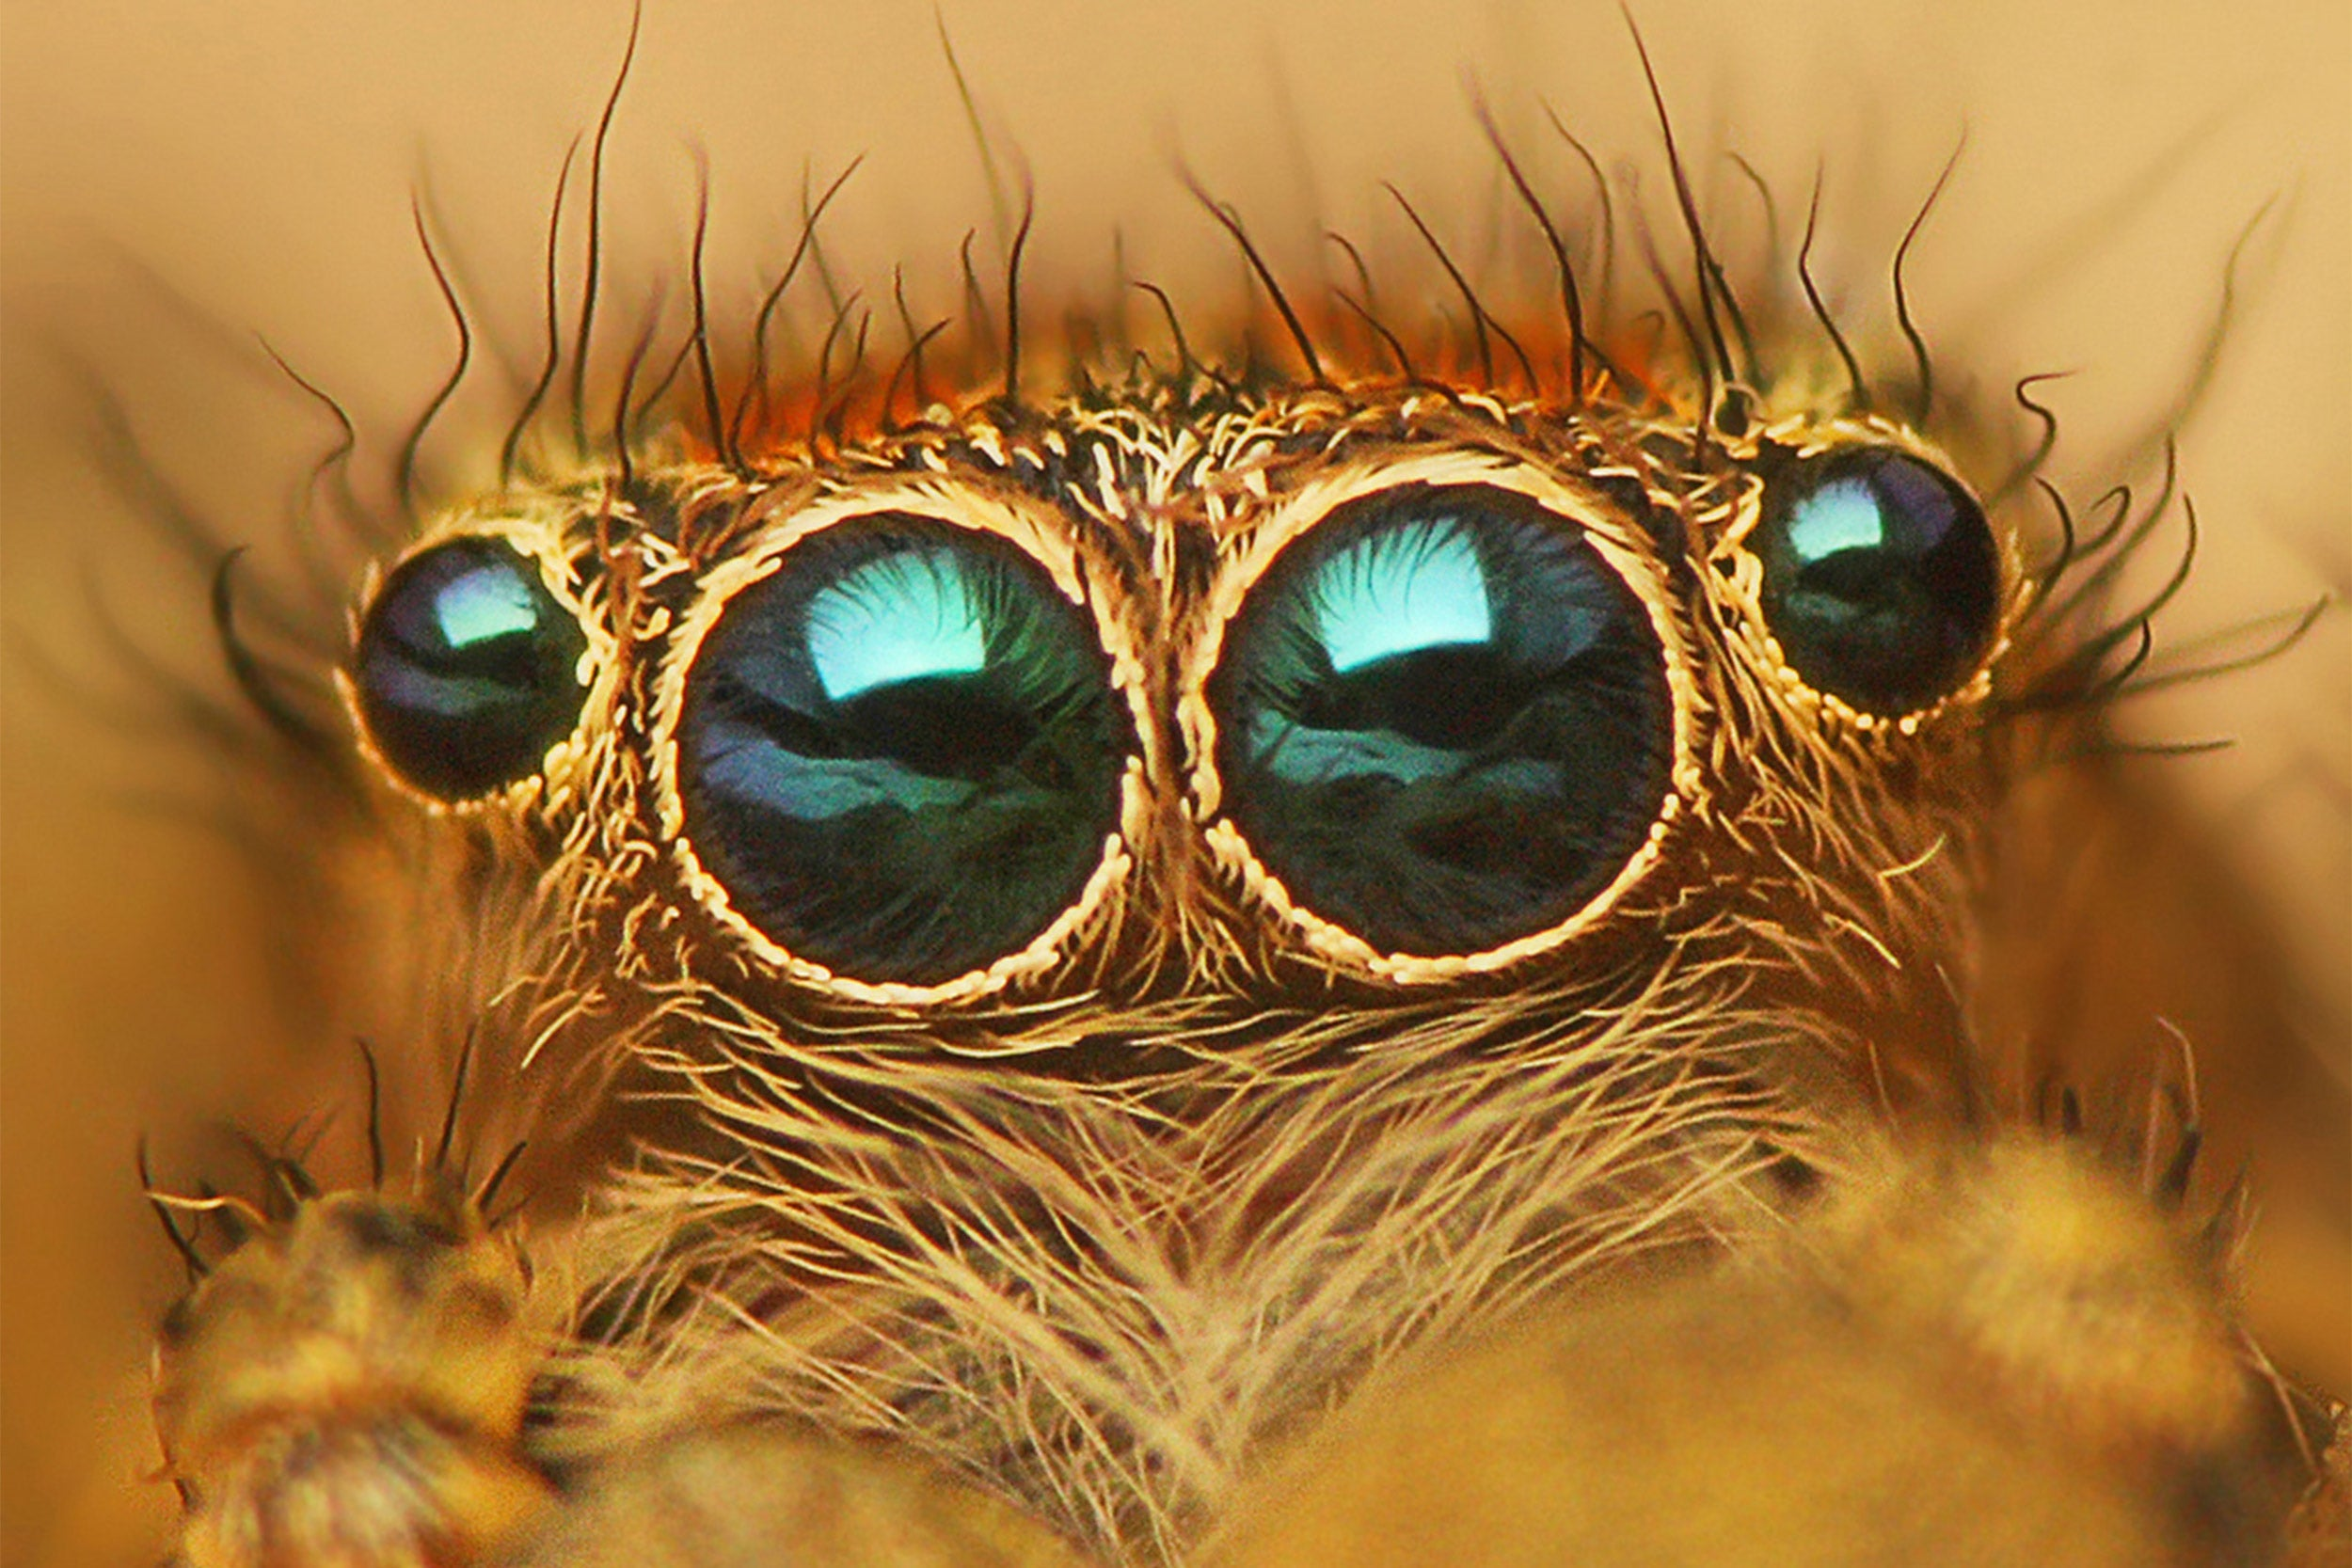 Spider eyes up close.